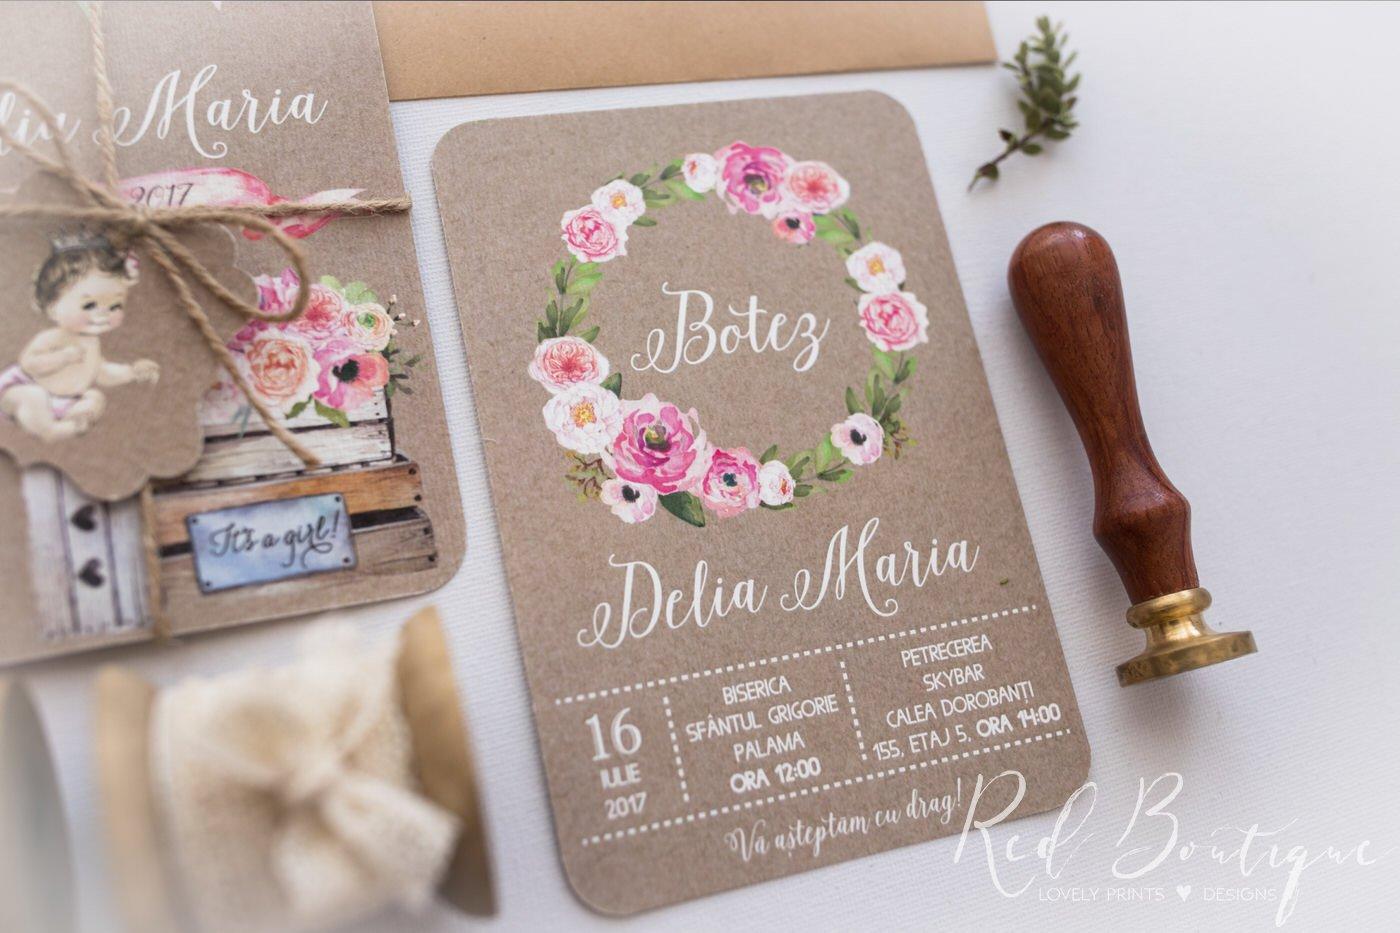 invitatie vintage cu fetita si coronita din flori roz